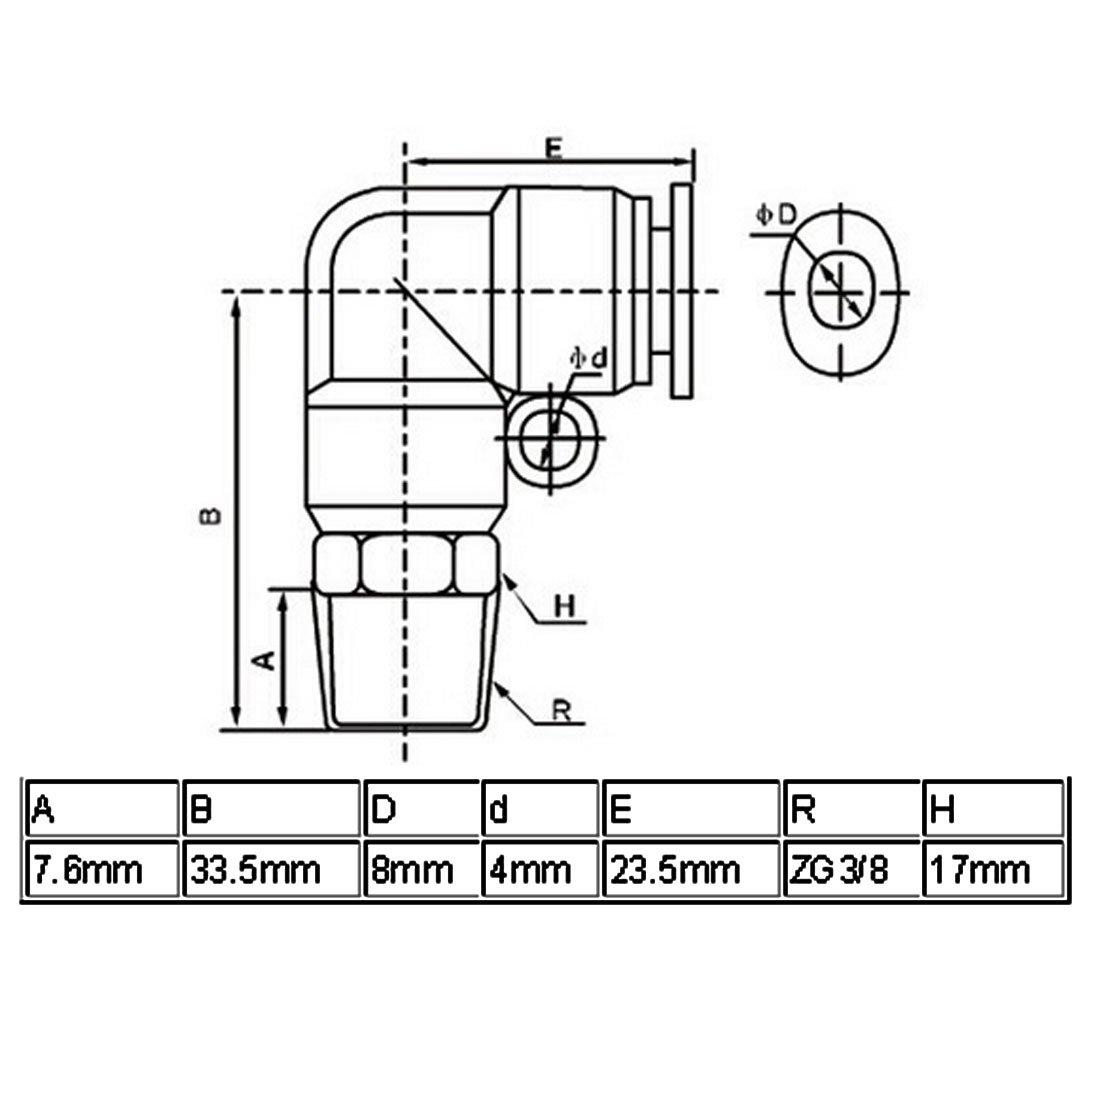 83 x 0.9 mm FIXMAN 686967 Placca ad Angolo Set di 10 Pezzi Silver